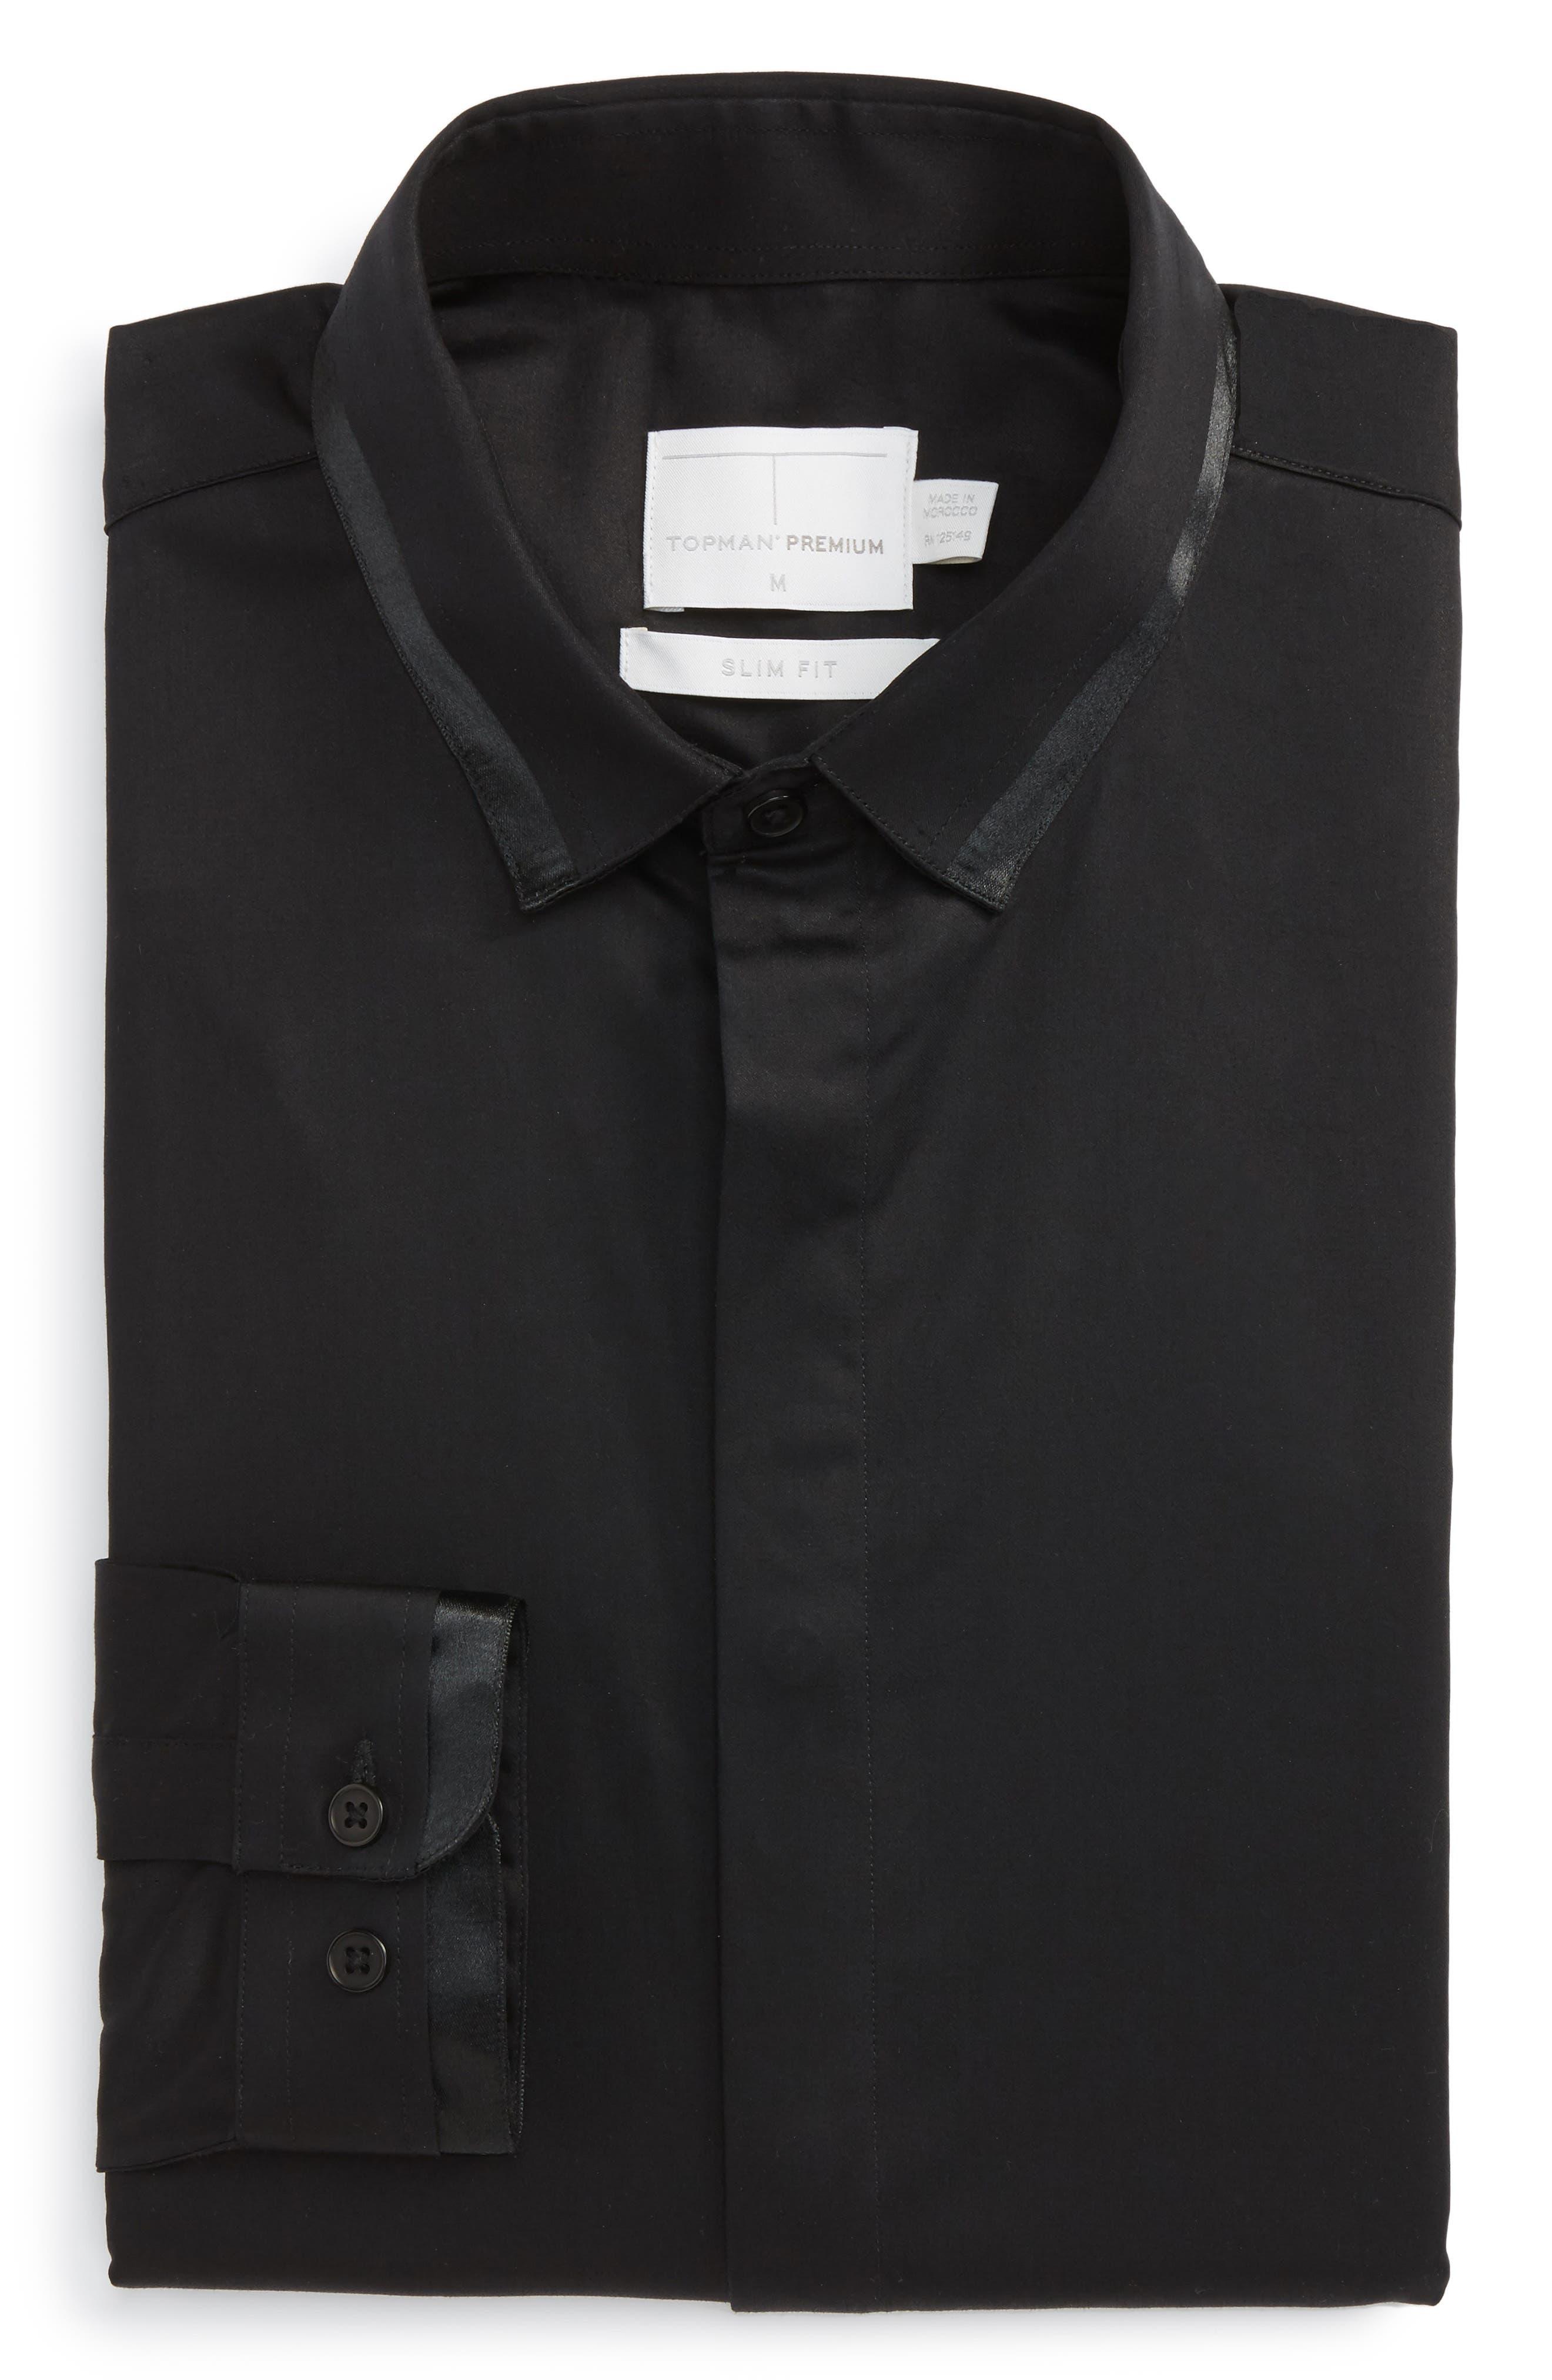 Topman Satin Trim Woven Shirt